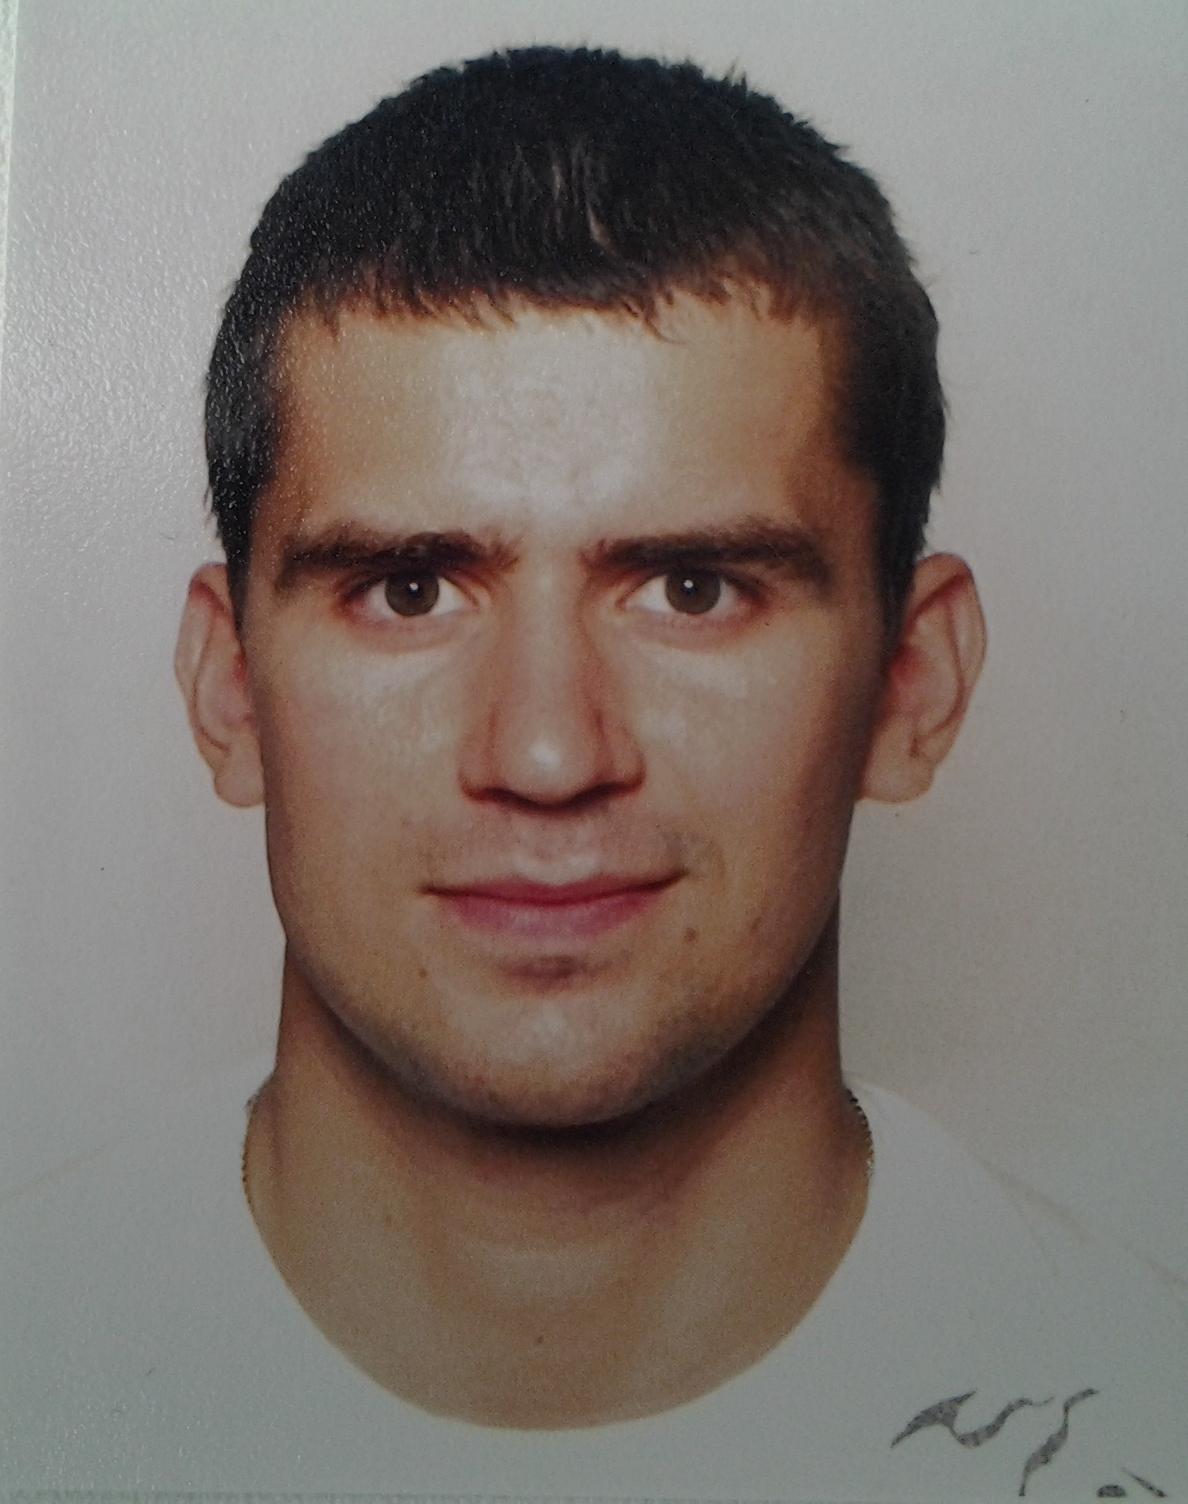 Aleksandr Goidin